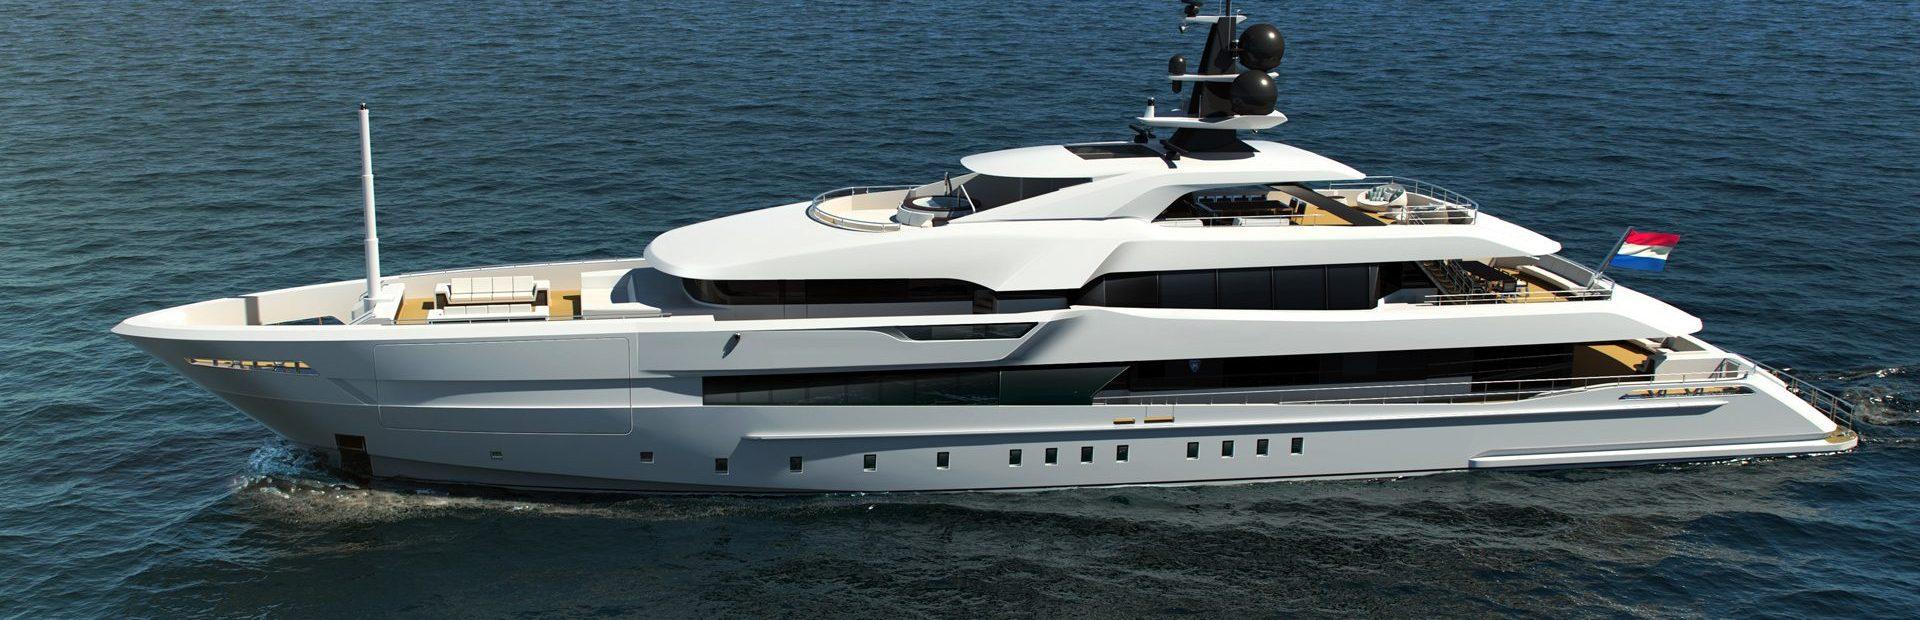 60m Steel Yacht Charter